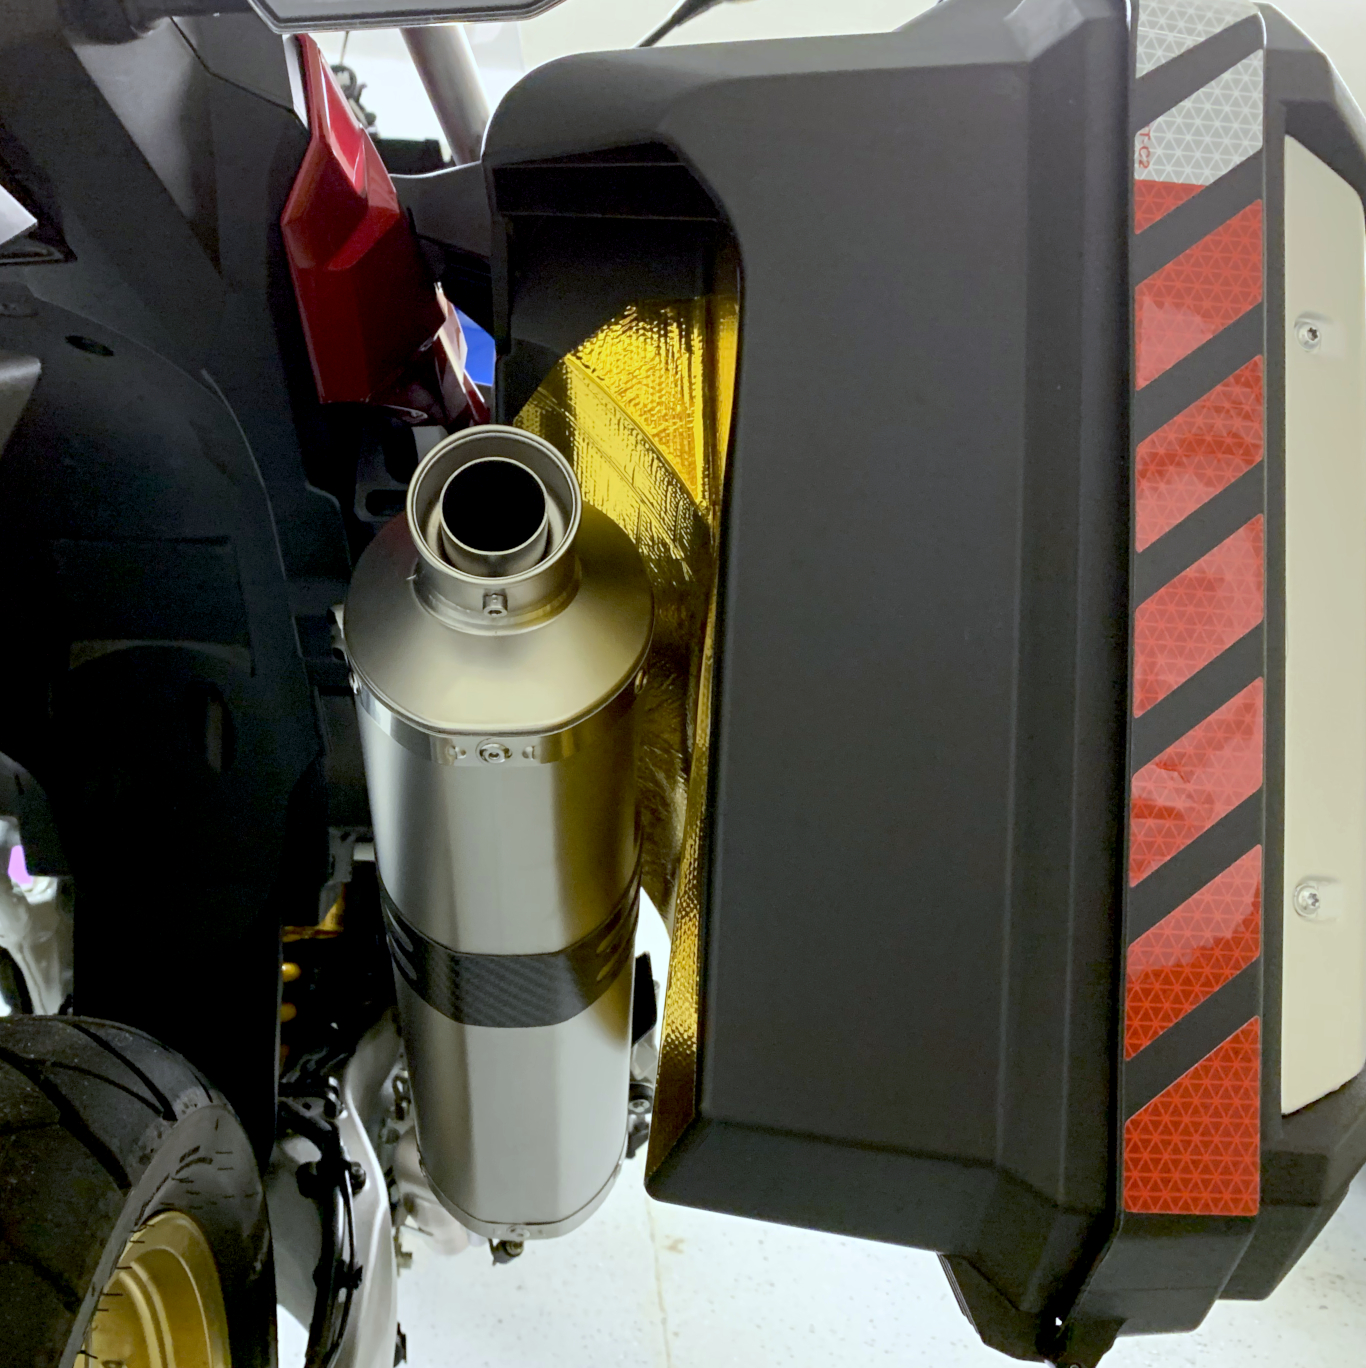 2018 ATAS Leo Vince Exhaust Pannier Gold Heat Reflective 2.jpg